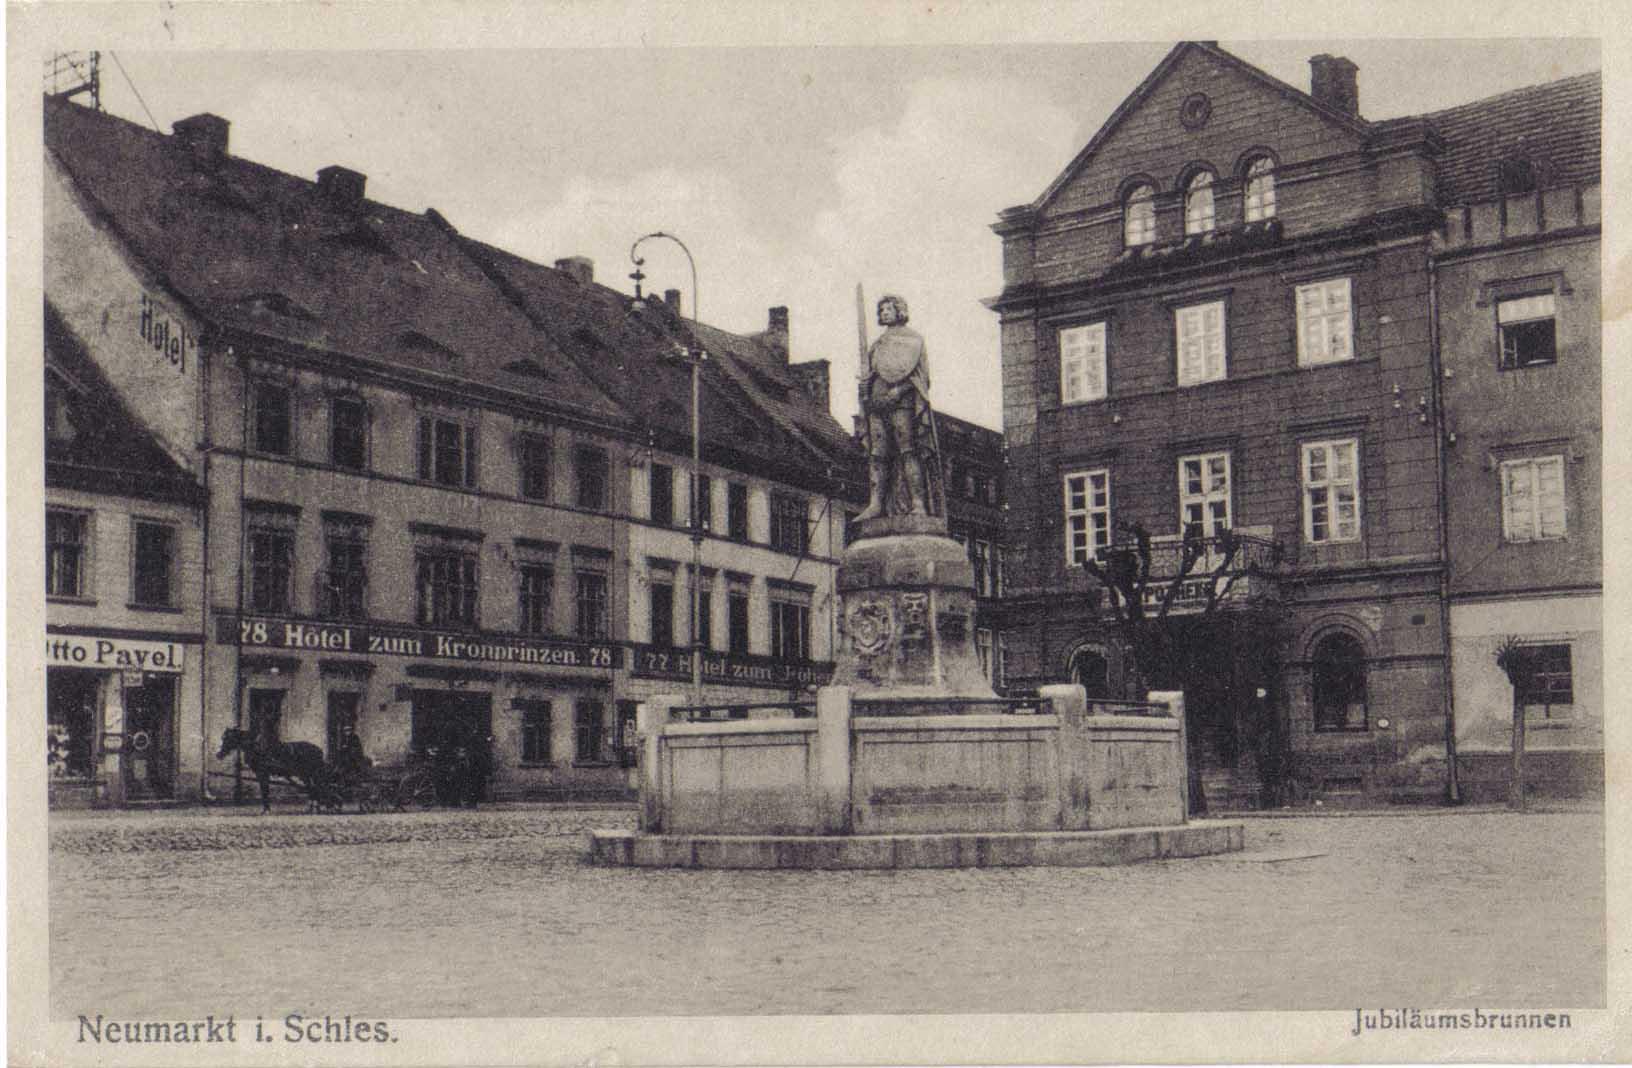 https://www.hameln.de/fileadmin/media/Hameln_Fotos/Staedtepartnerschaft/Neumarkt/Neumarkt_177.jpg